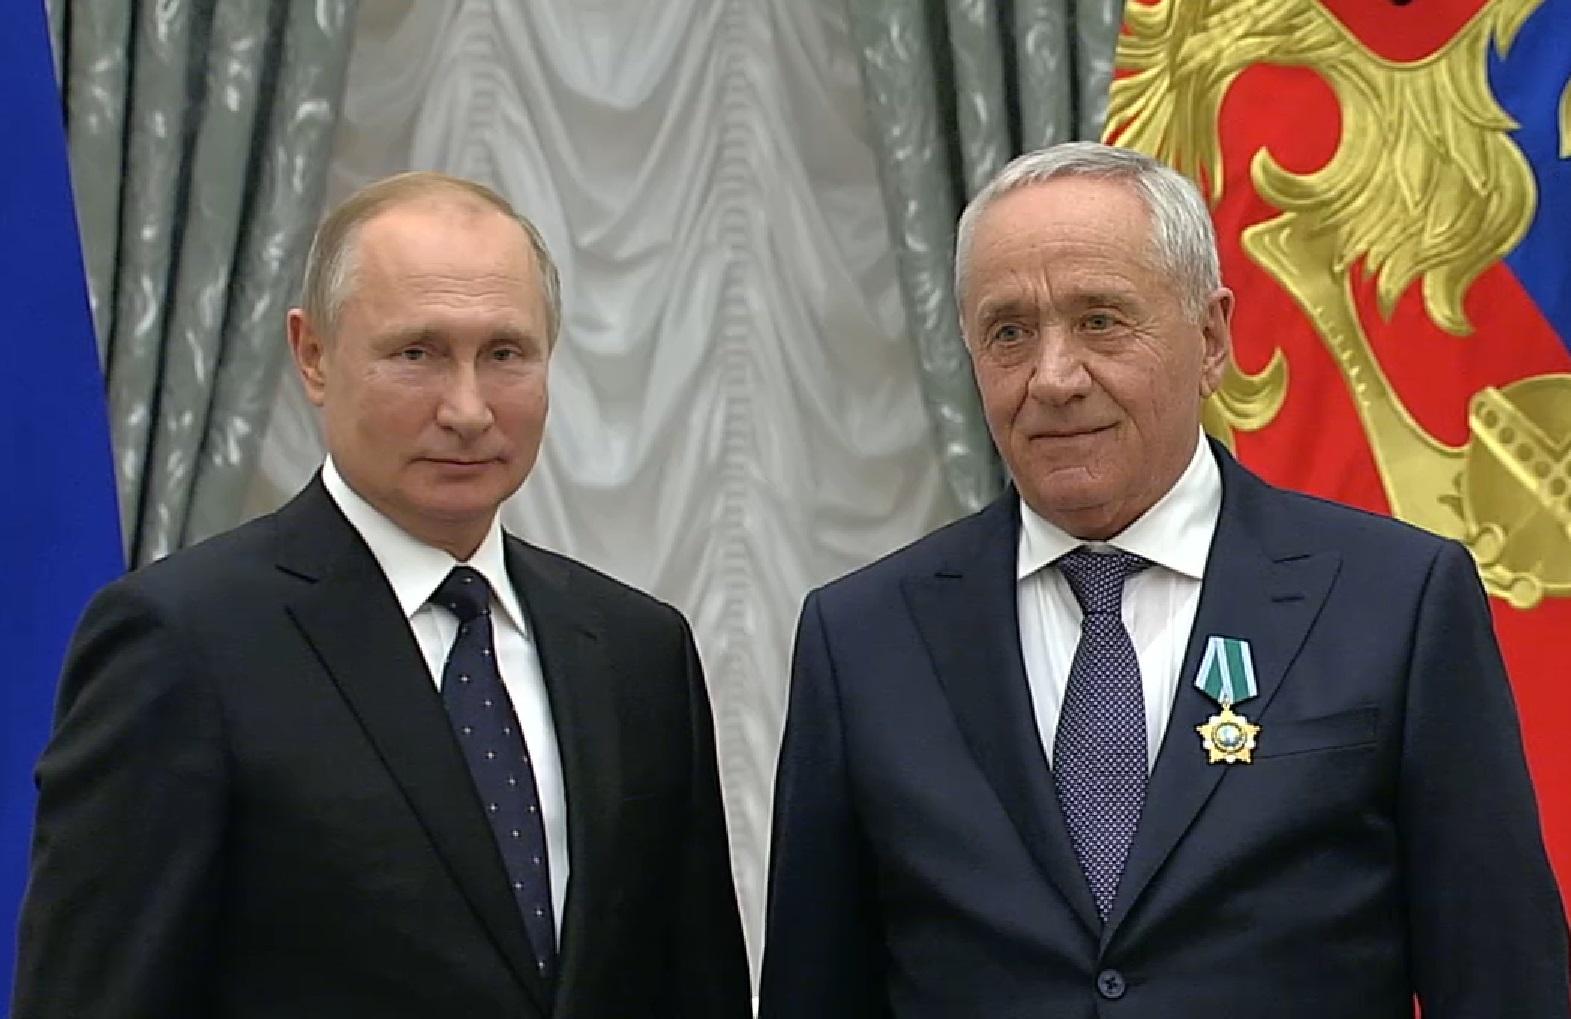 Владимир Путин наградил орденом врача из КЧР